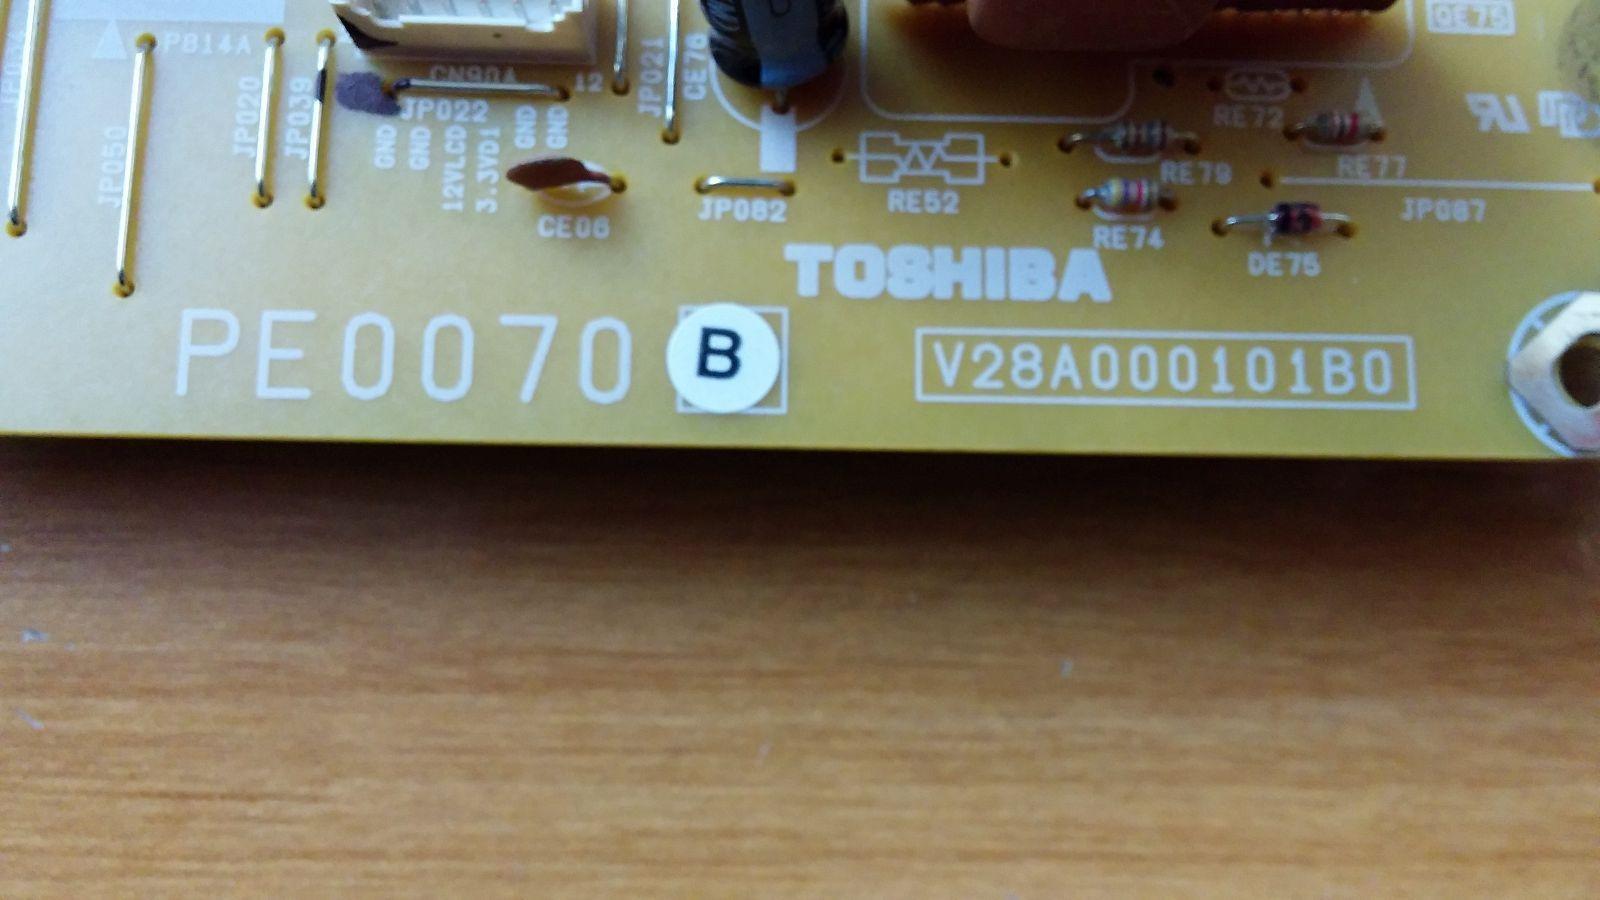 Toshiba 75002920 (PE0070B, V28A000101B0) Low B Board